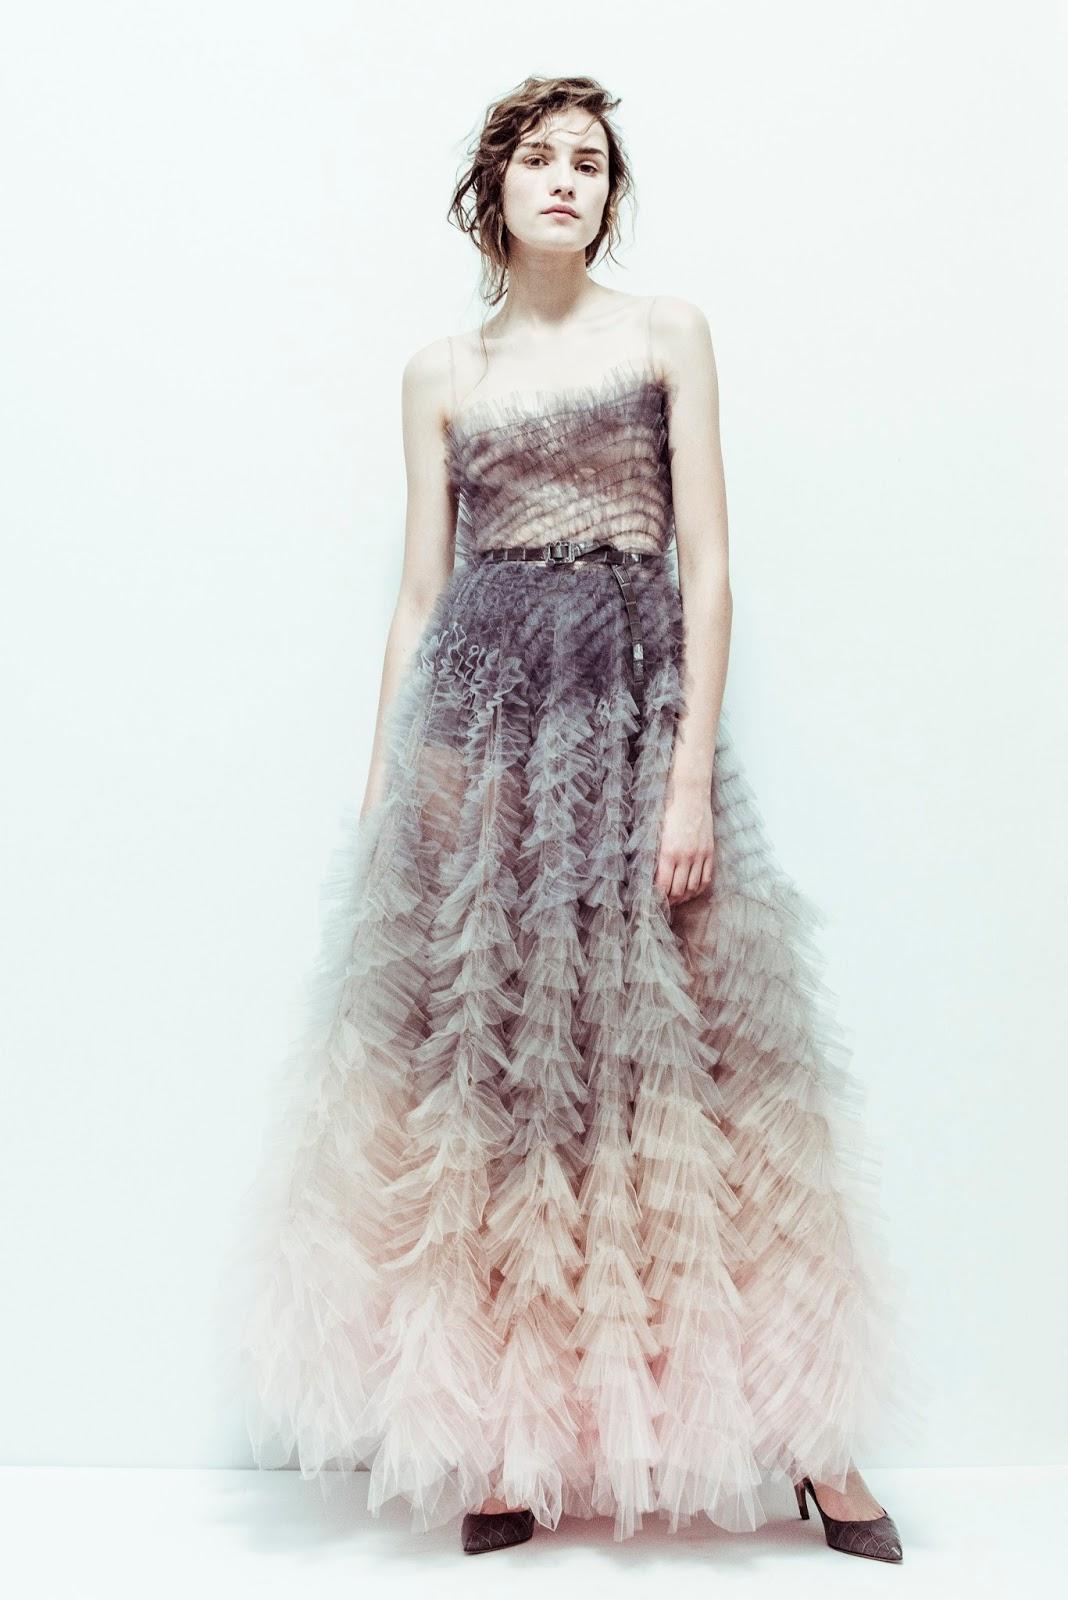 Dior's Haute Couture BTS Videos, Interviews, and Savoir-Faire